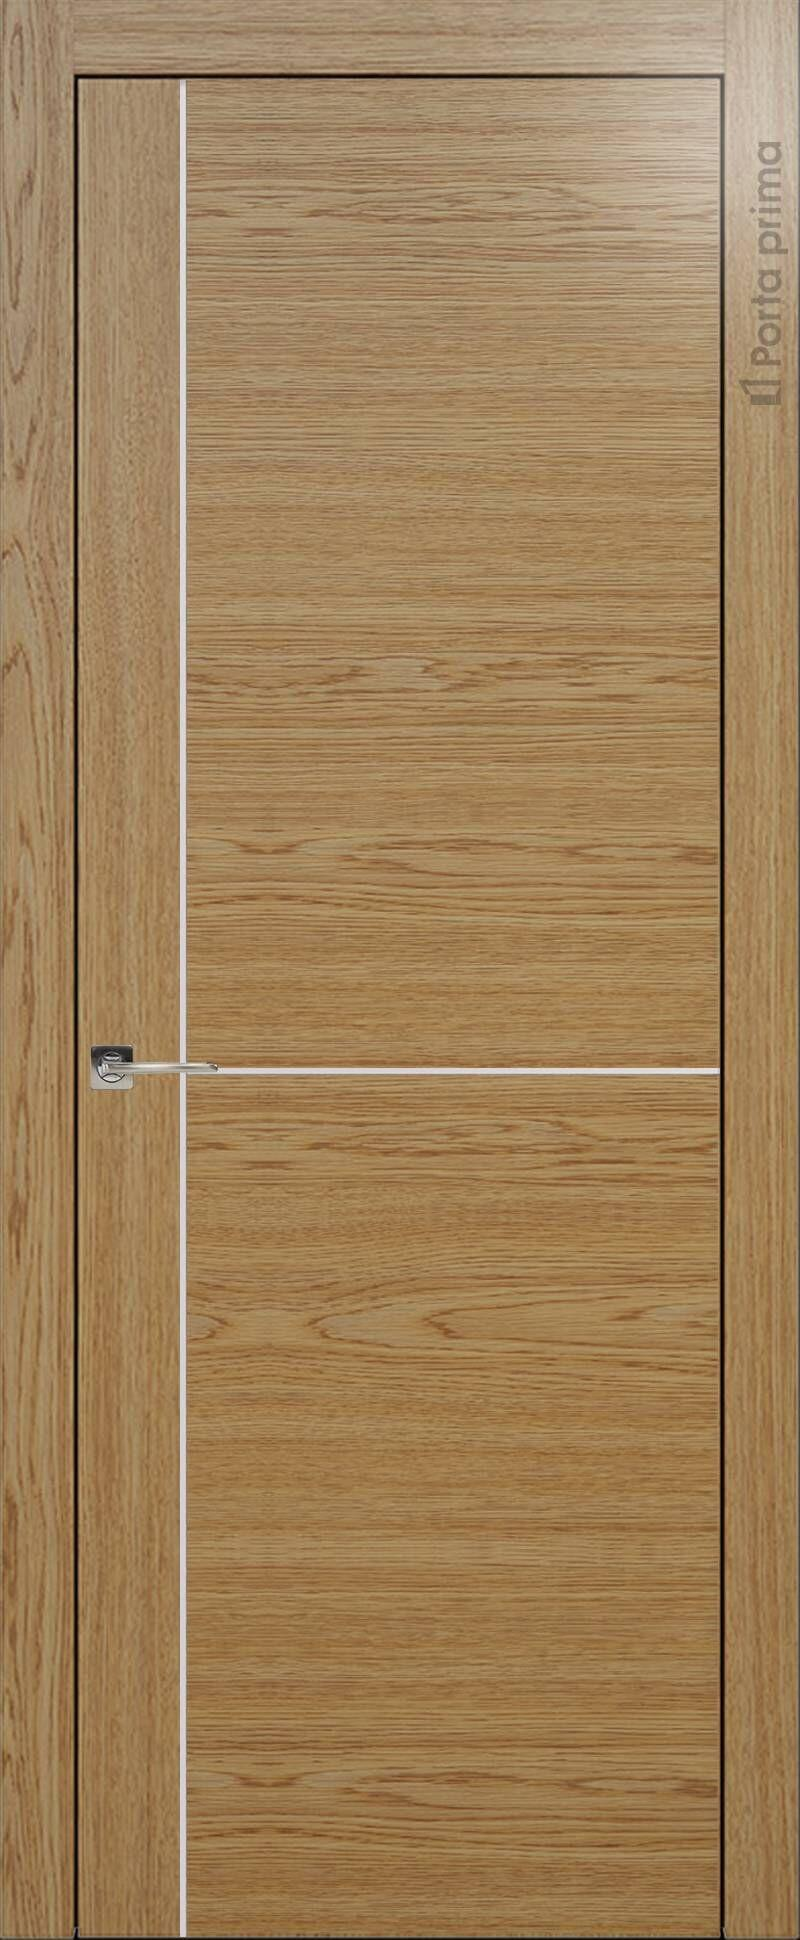 Tivoli Е-3 цвет - Дуб карамель Без стекла (ДГ)